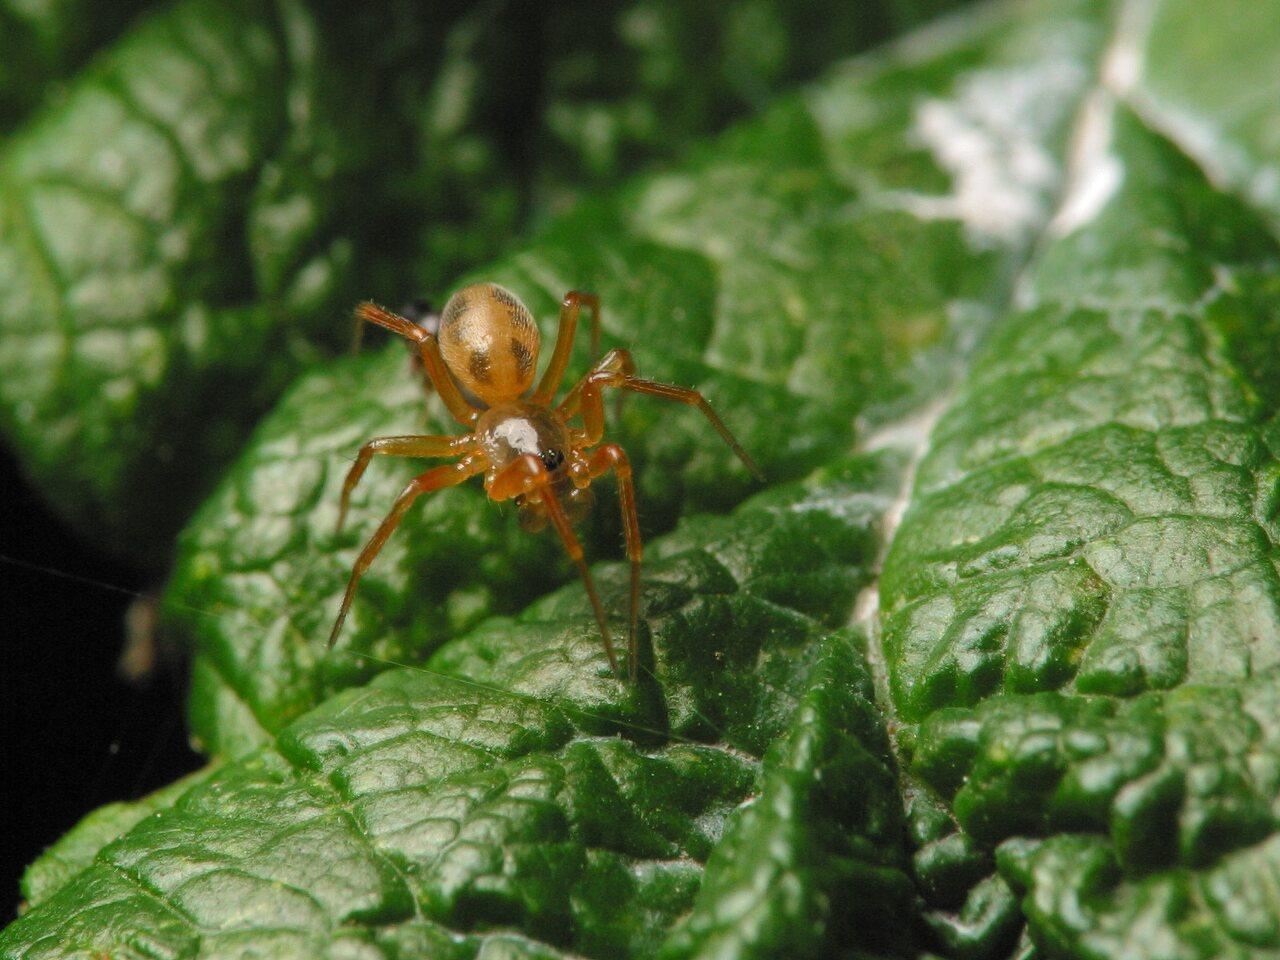 Araneae-4446.jpg